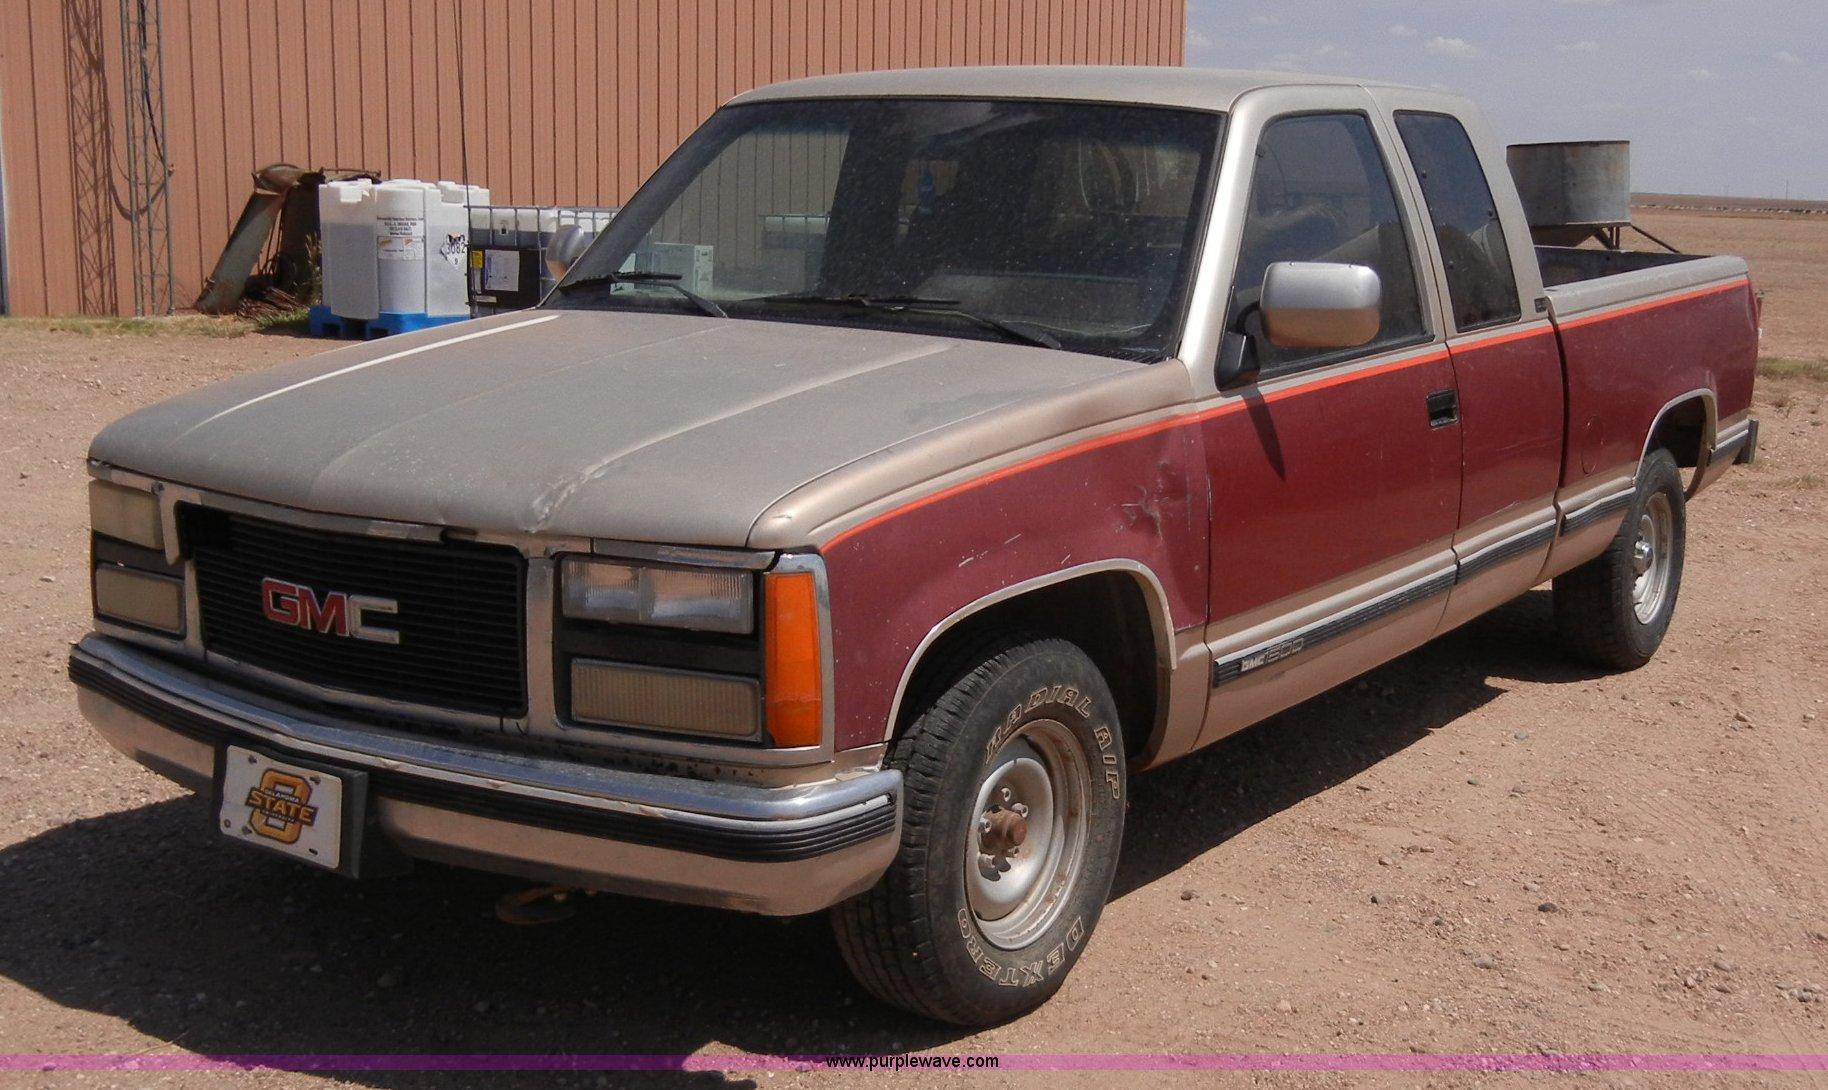 1992 gmc sierra 1500 extended cab pickup truck in hooker ok item a5398 sold purple wave 1992 gmc sierra 1500 extended cab